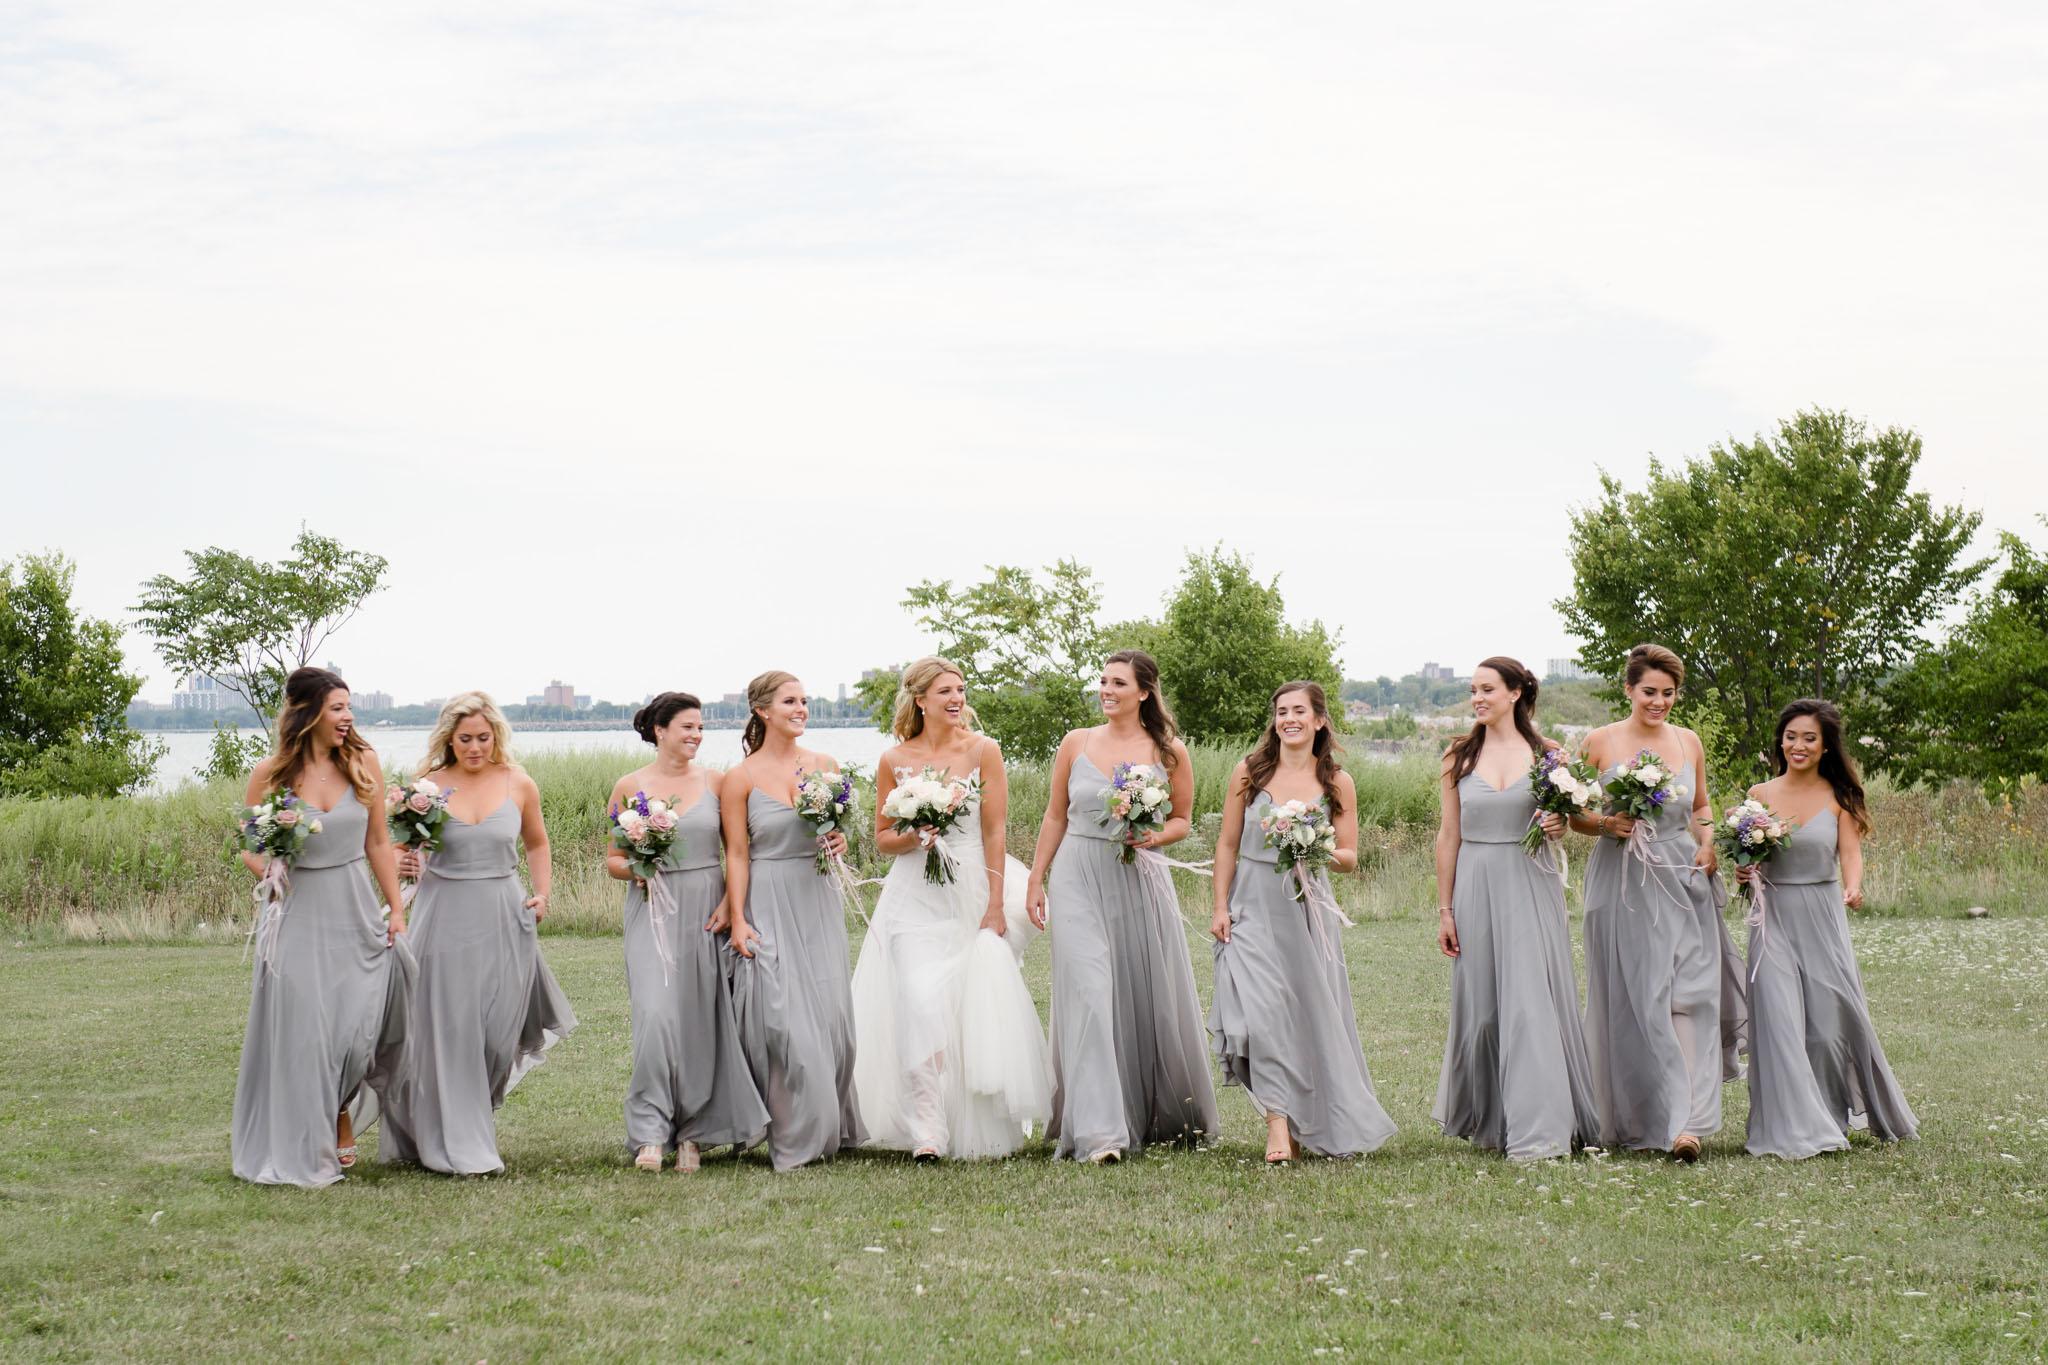 bridgeport-art-center-wedding-photos-13.jpg